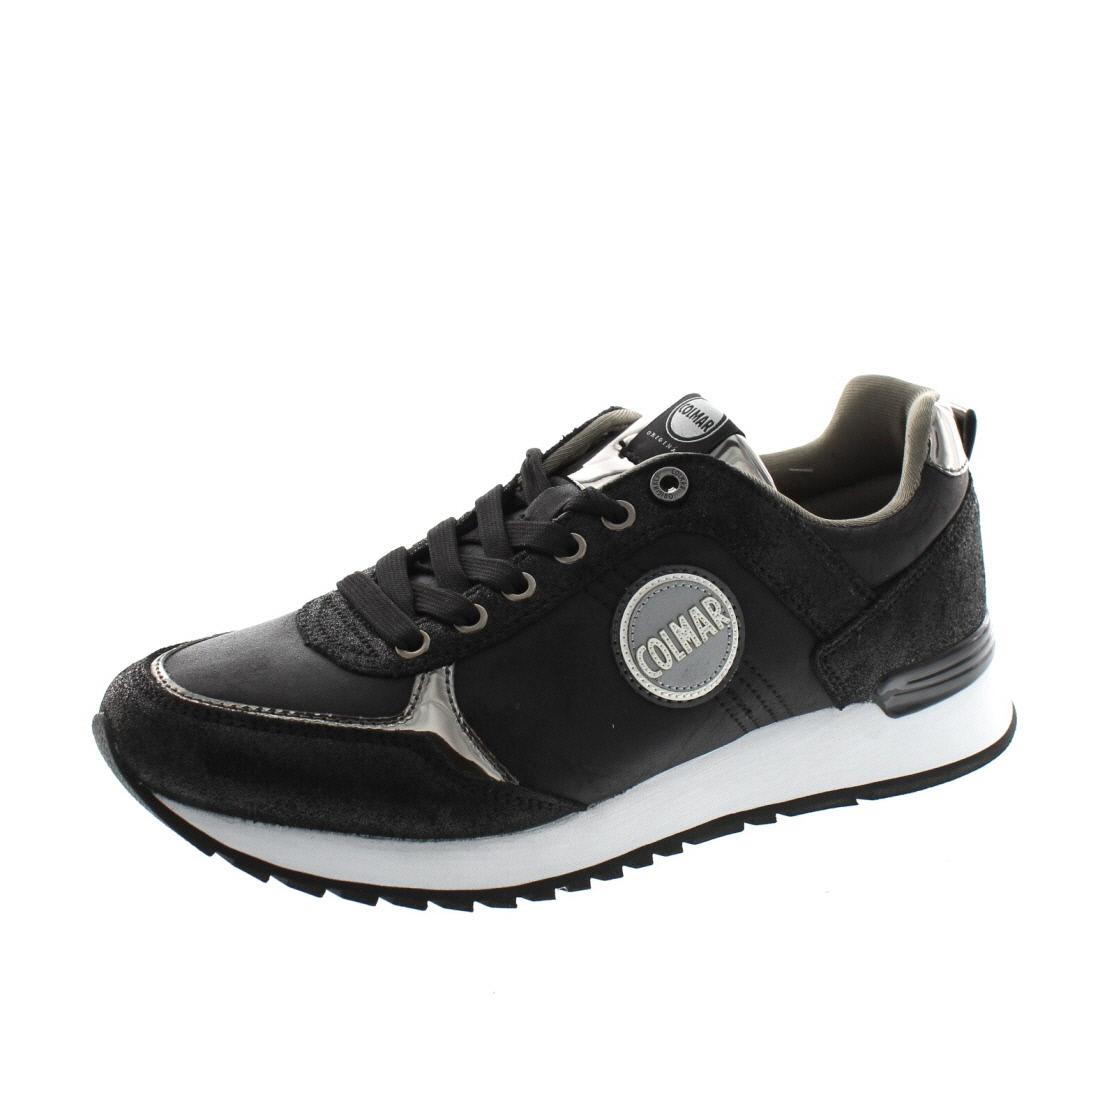 COLMAR Damen - Sneaker Travis Punk 054 - black dark silver